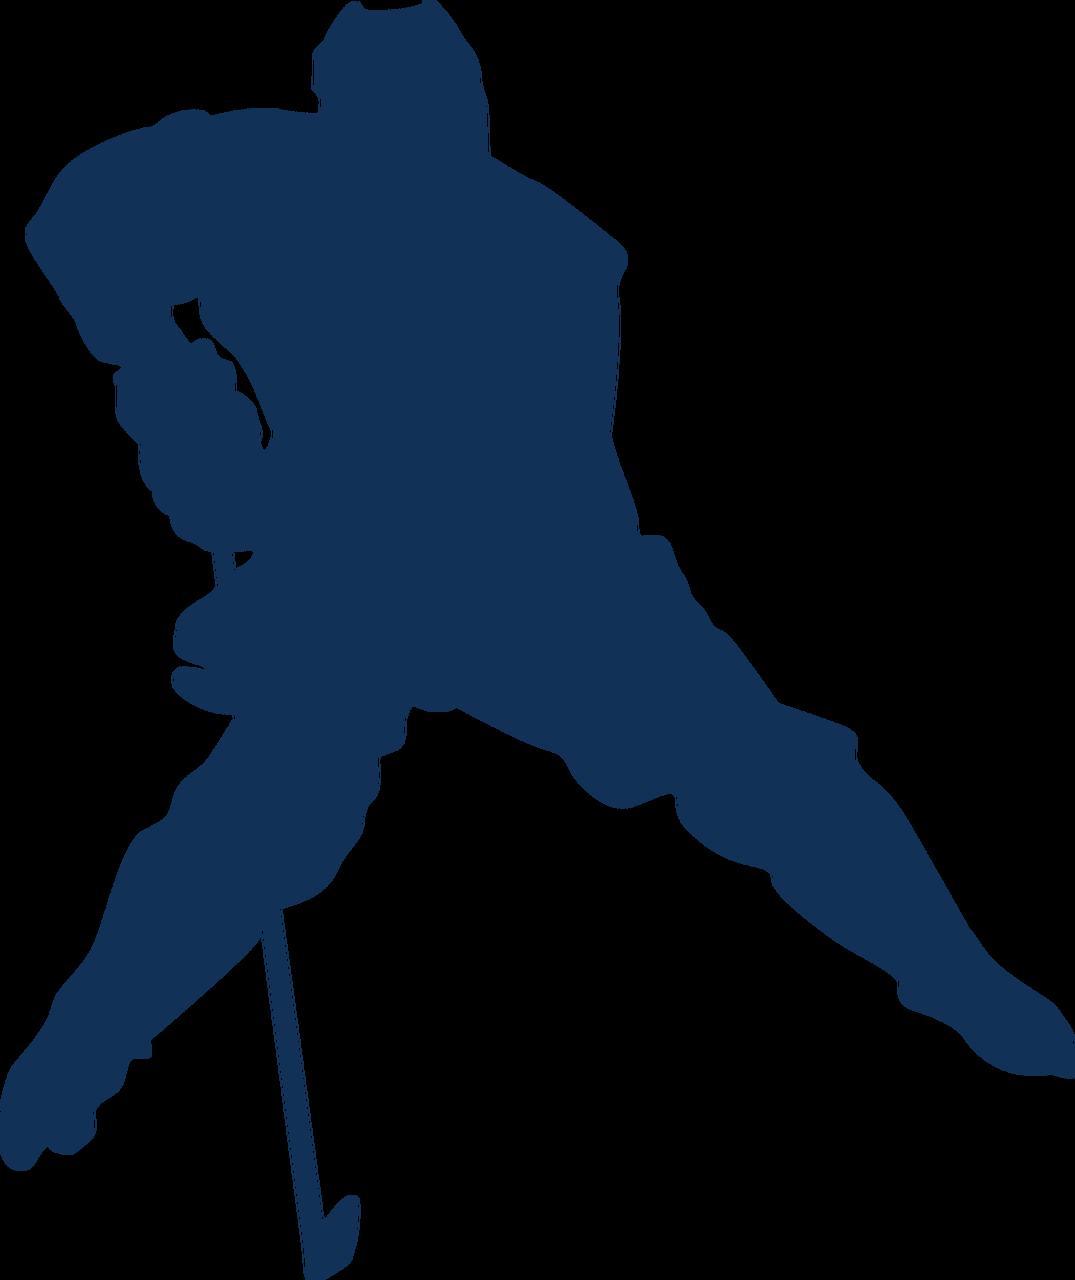 Hockey Silhouette #2 SVG Cut File